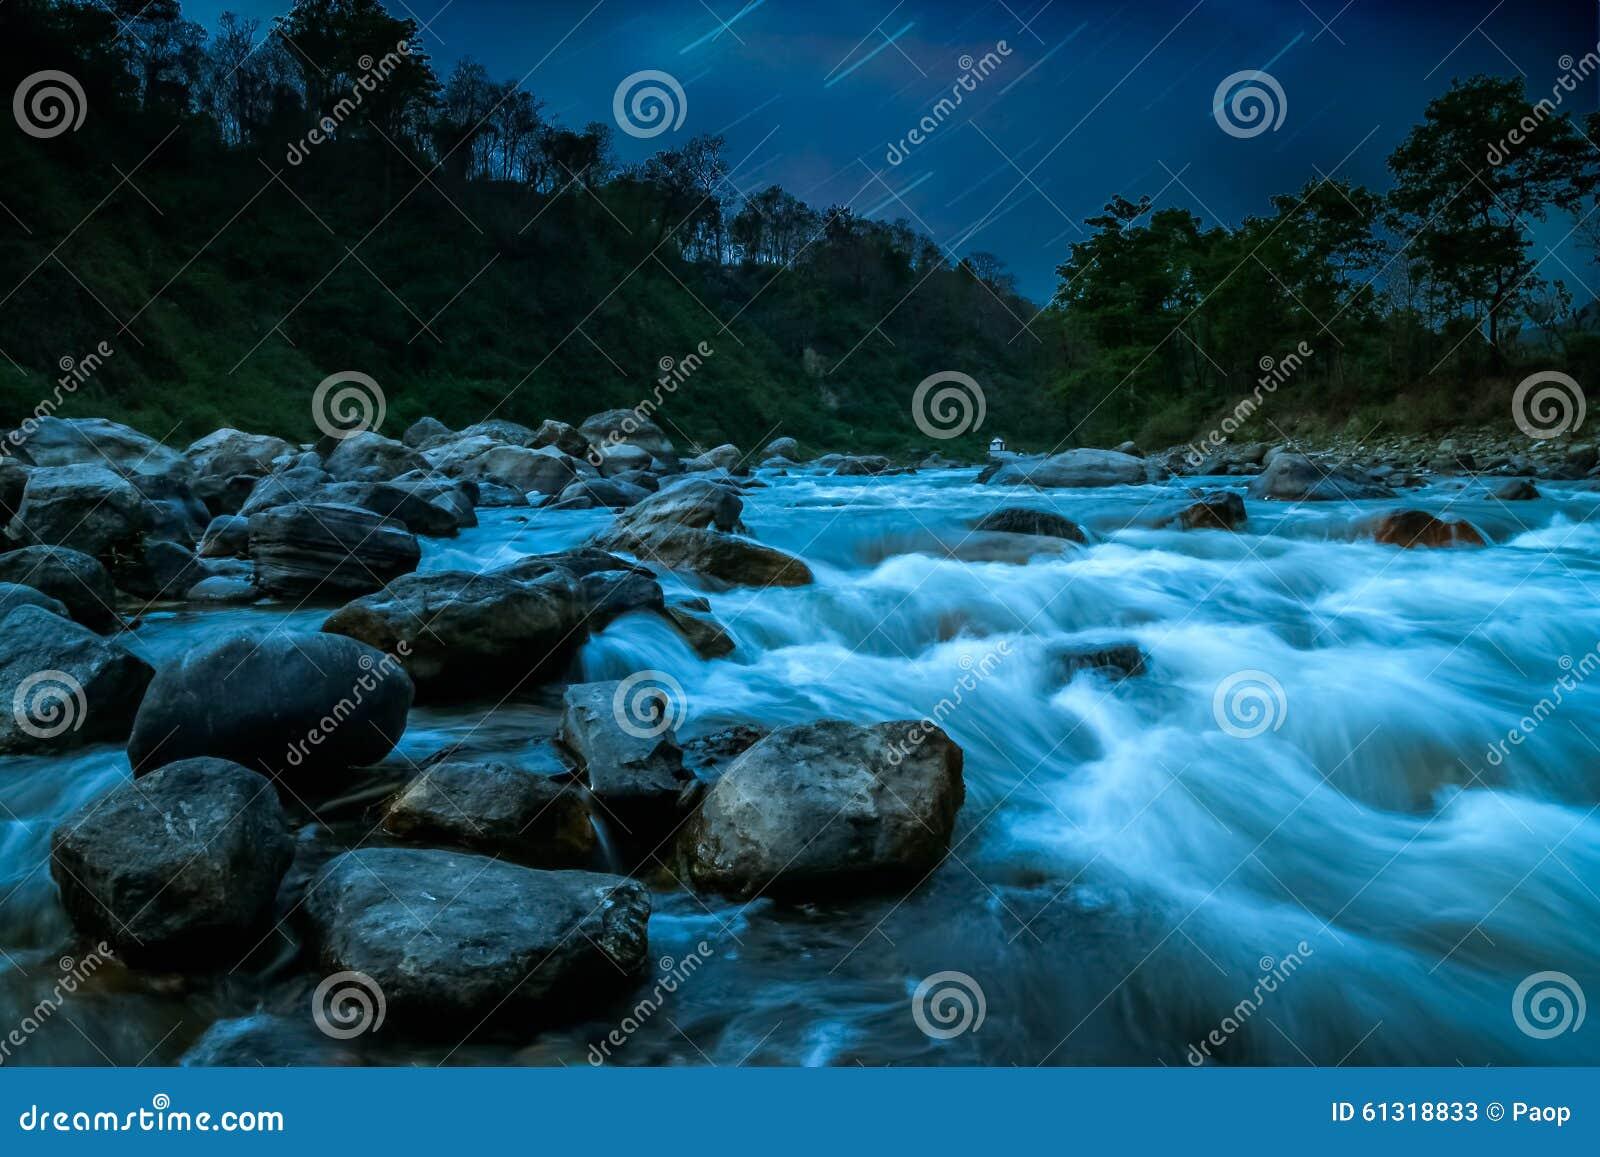 Mountain river nightscape